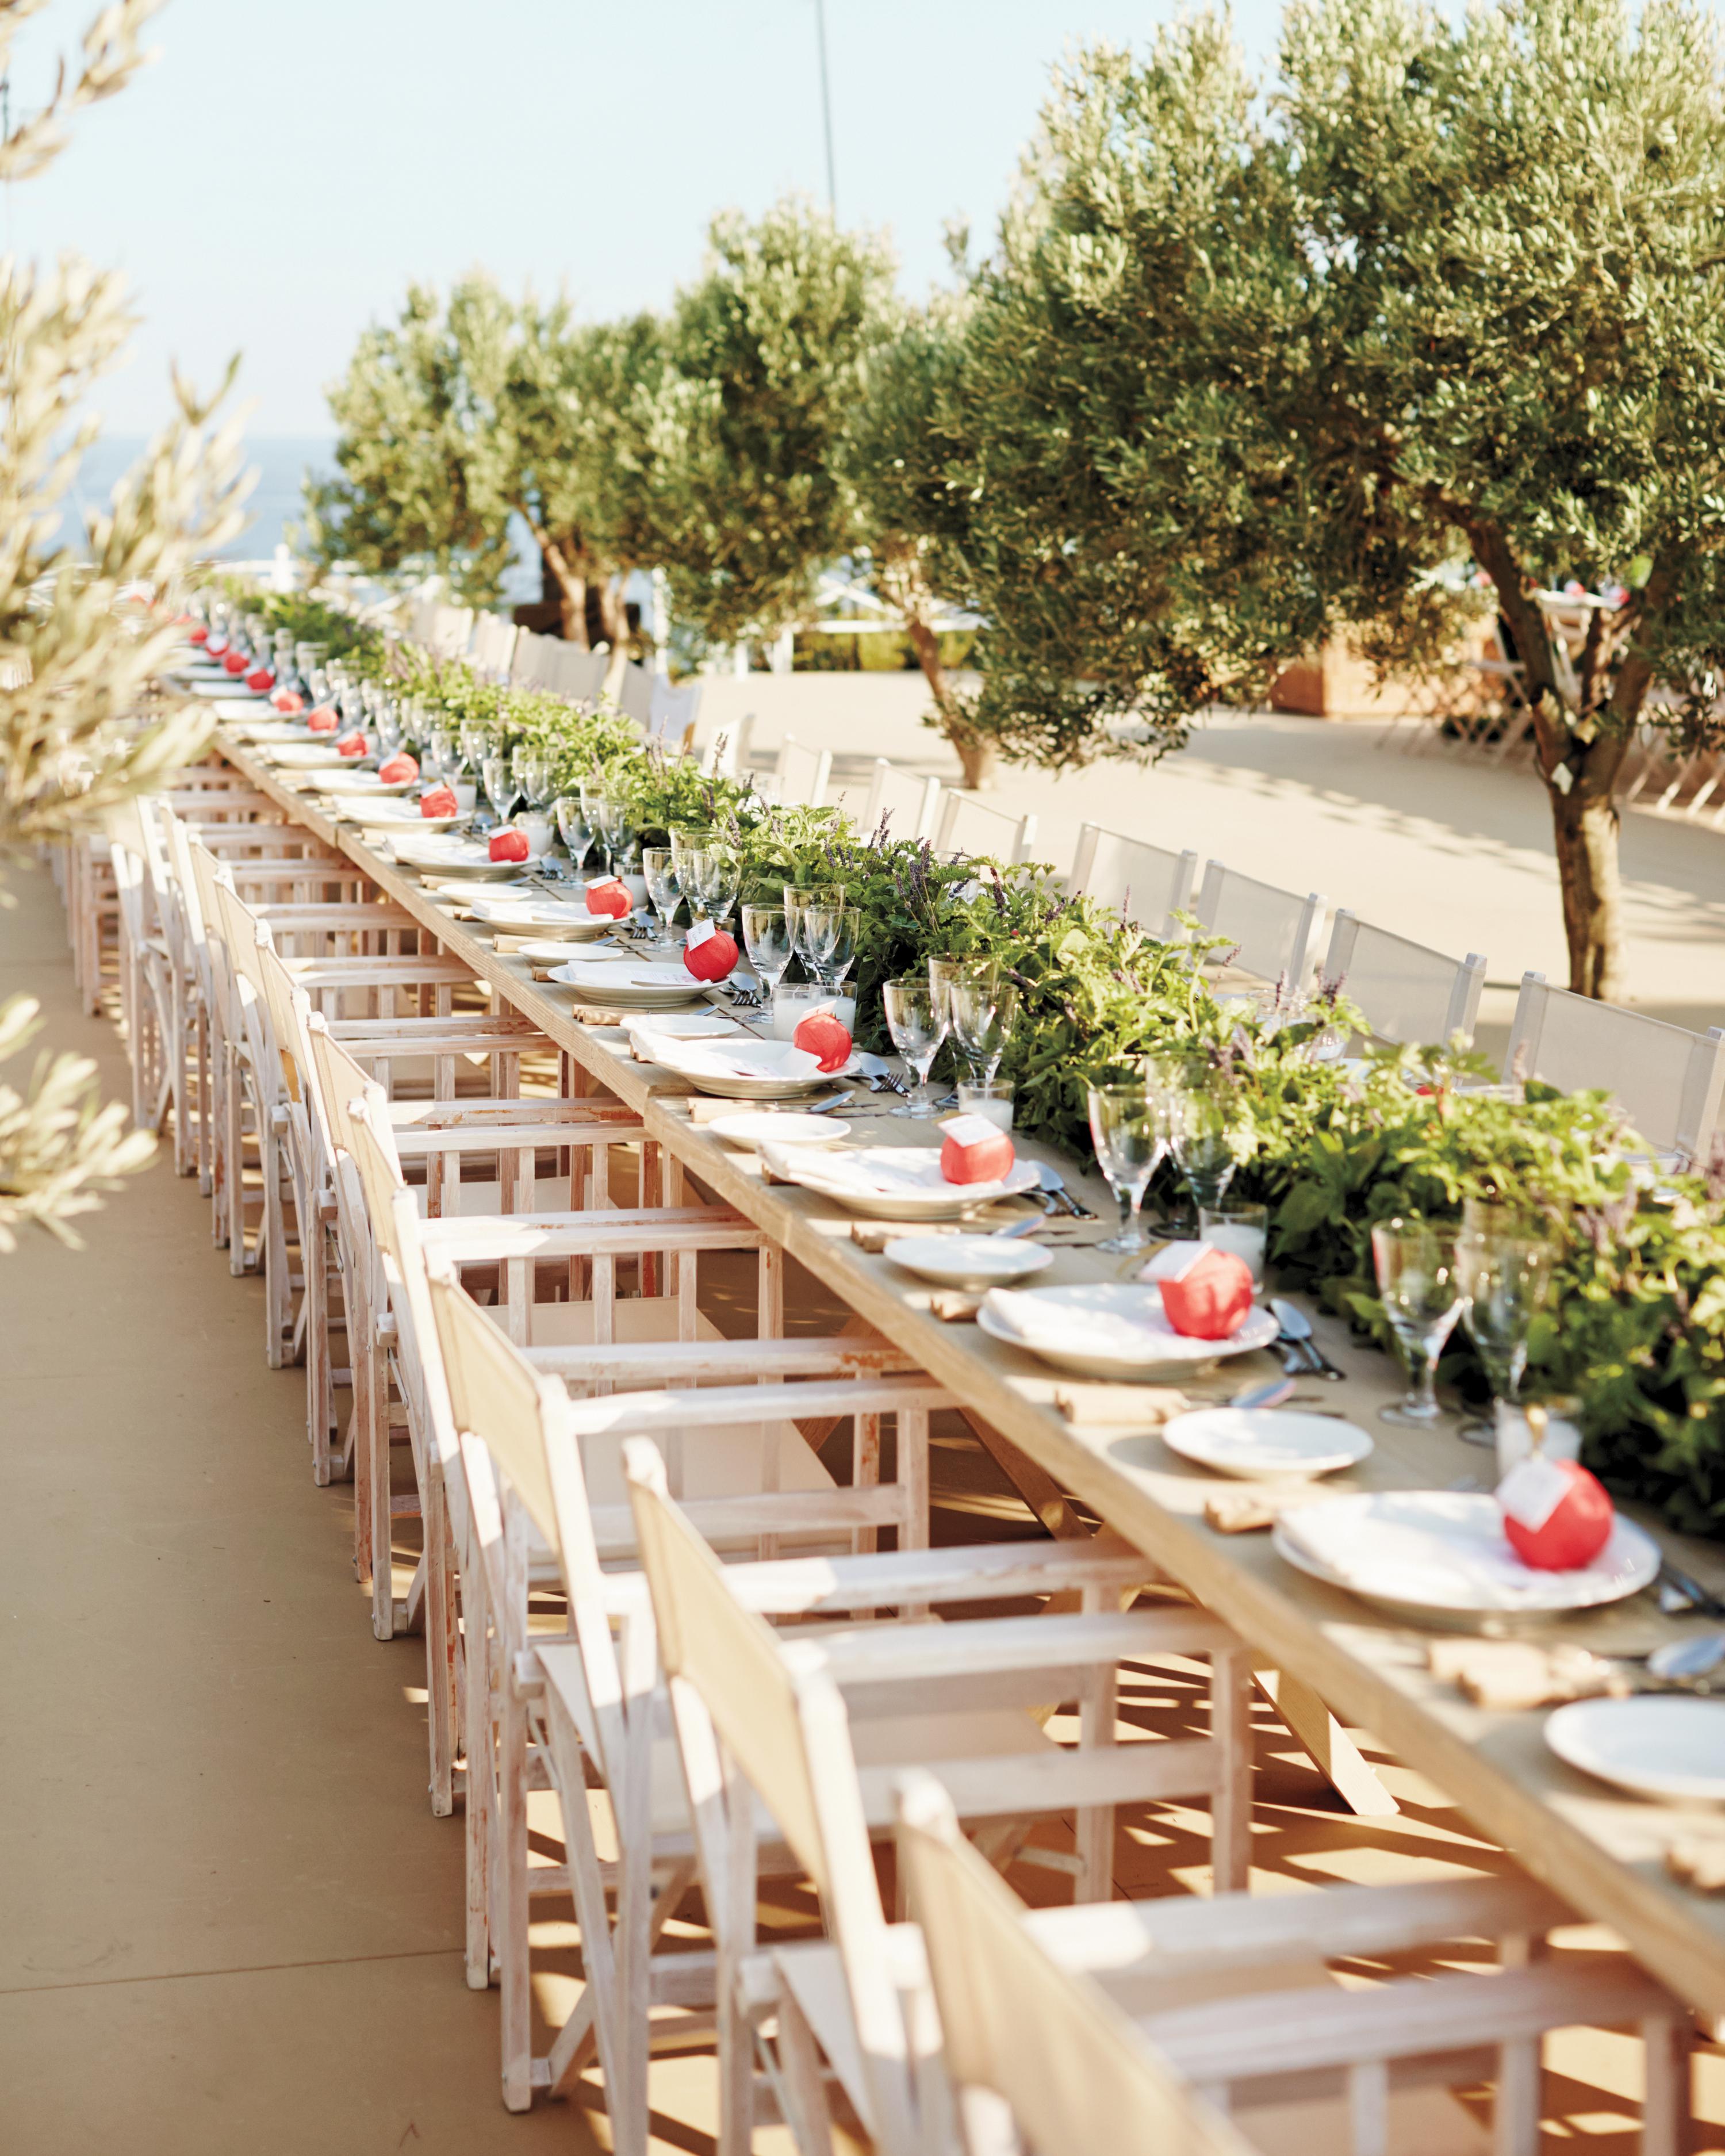 ana-alden-wedding-greece-611a3661-s111821.jpg